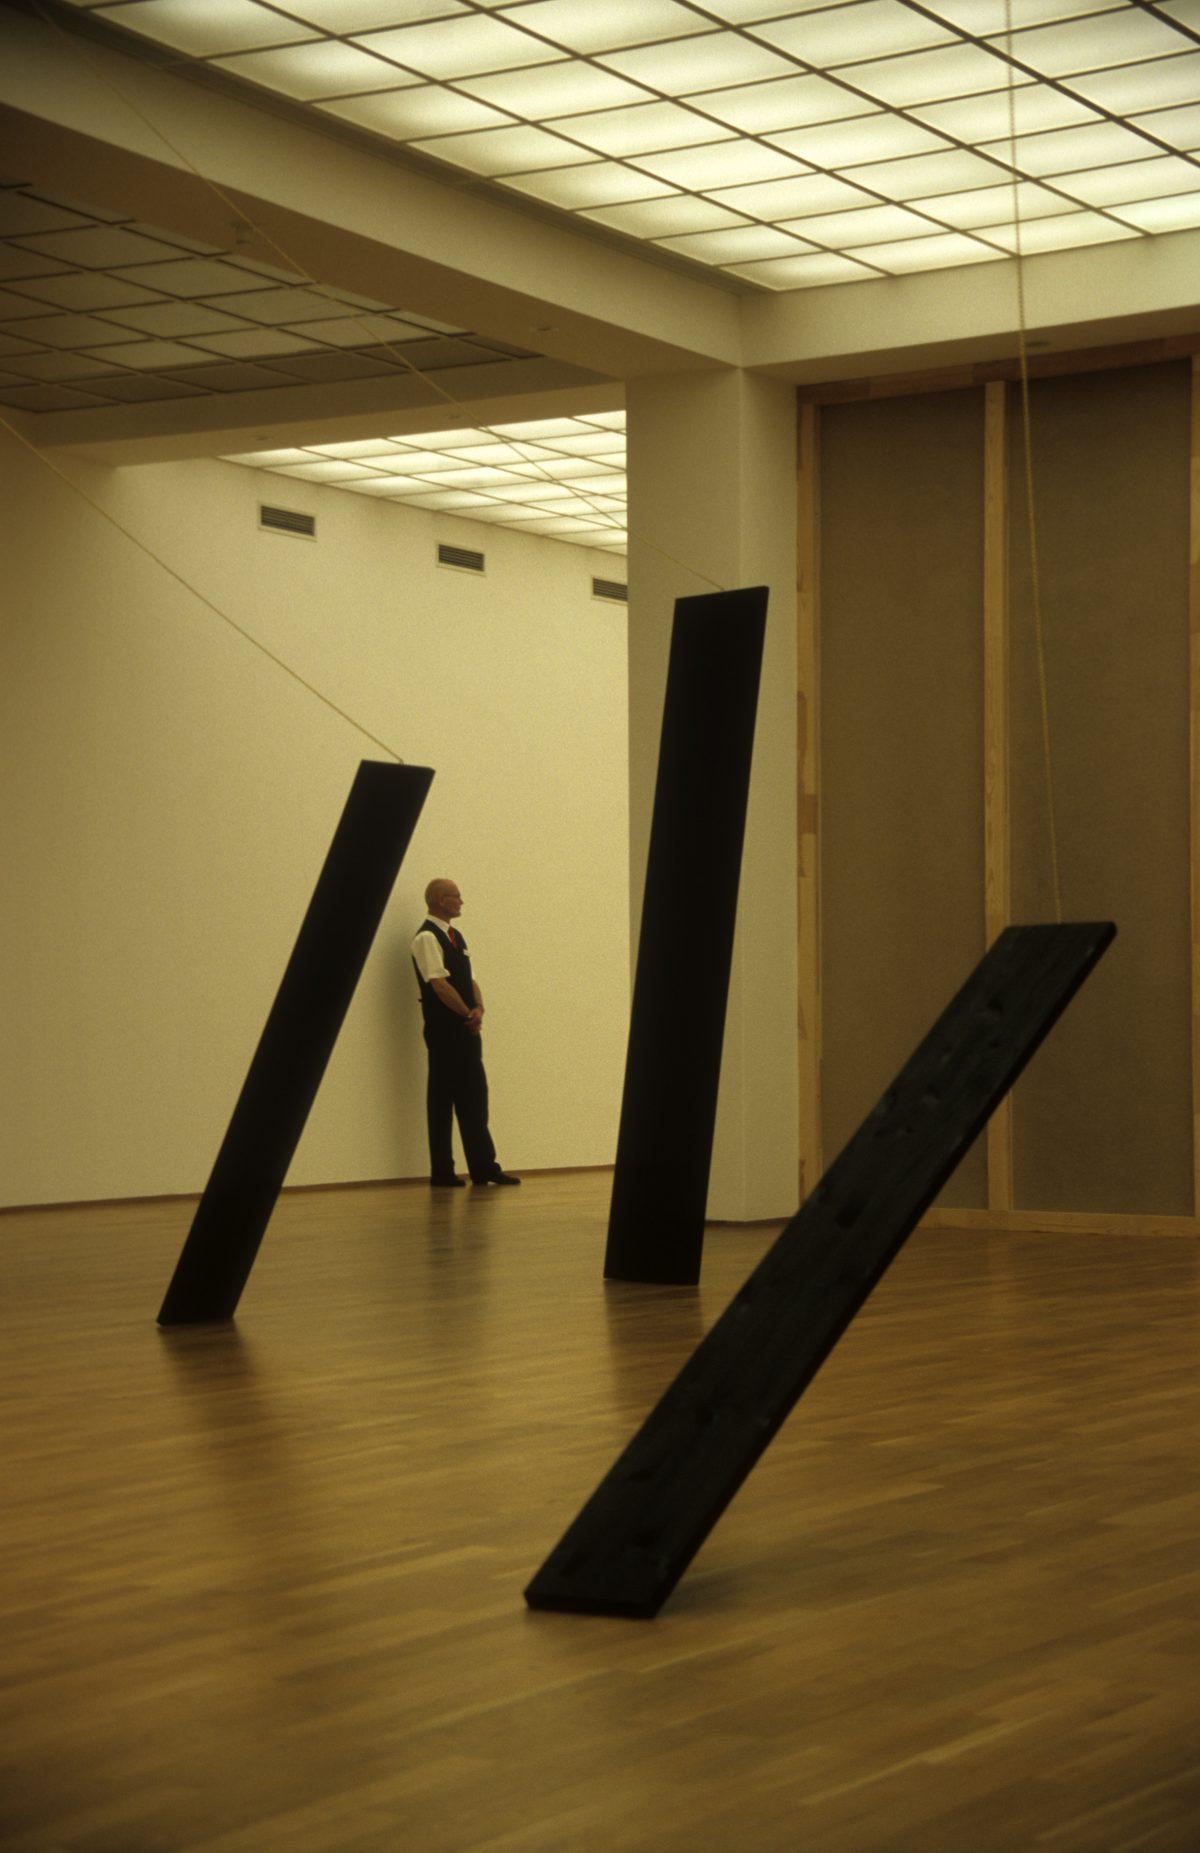 Security - At Hamburger Bahnhof Contemporary art museum, art, museum, male, sculpture